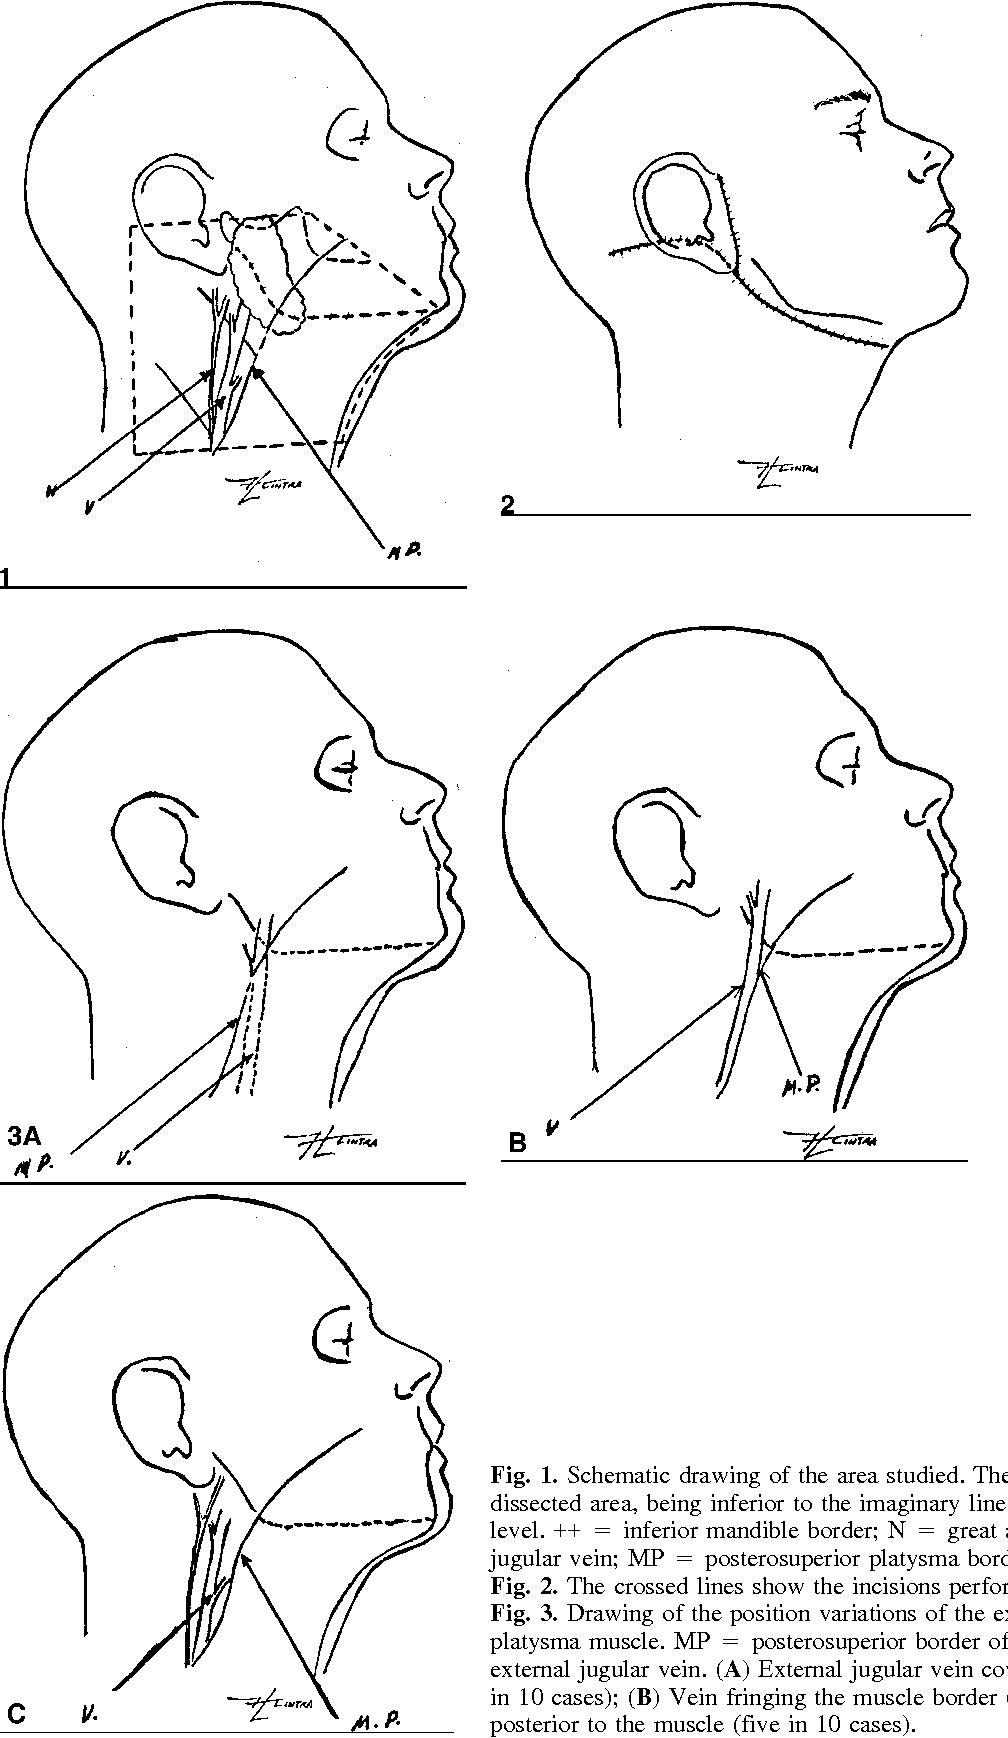 Anatomical Variations Analysis of the External Jugular Vein, Great ...